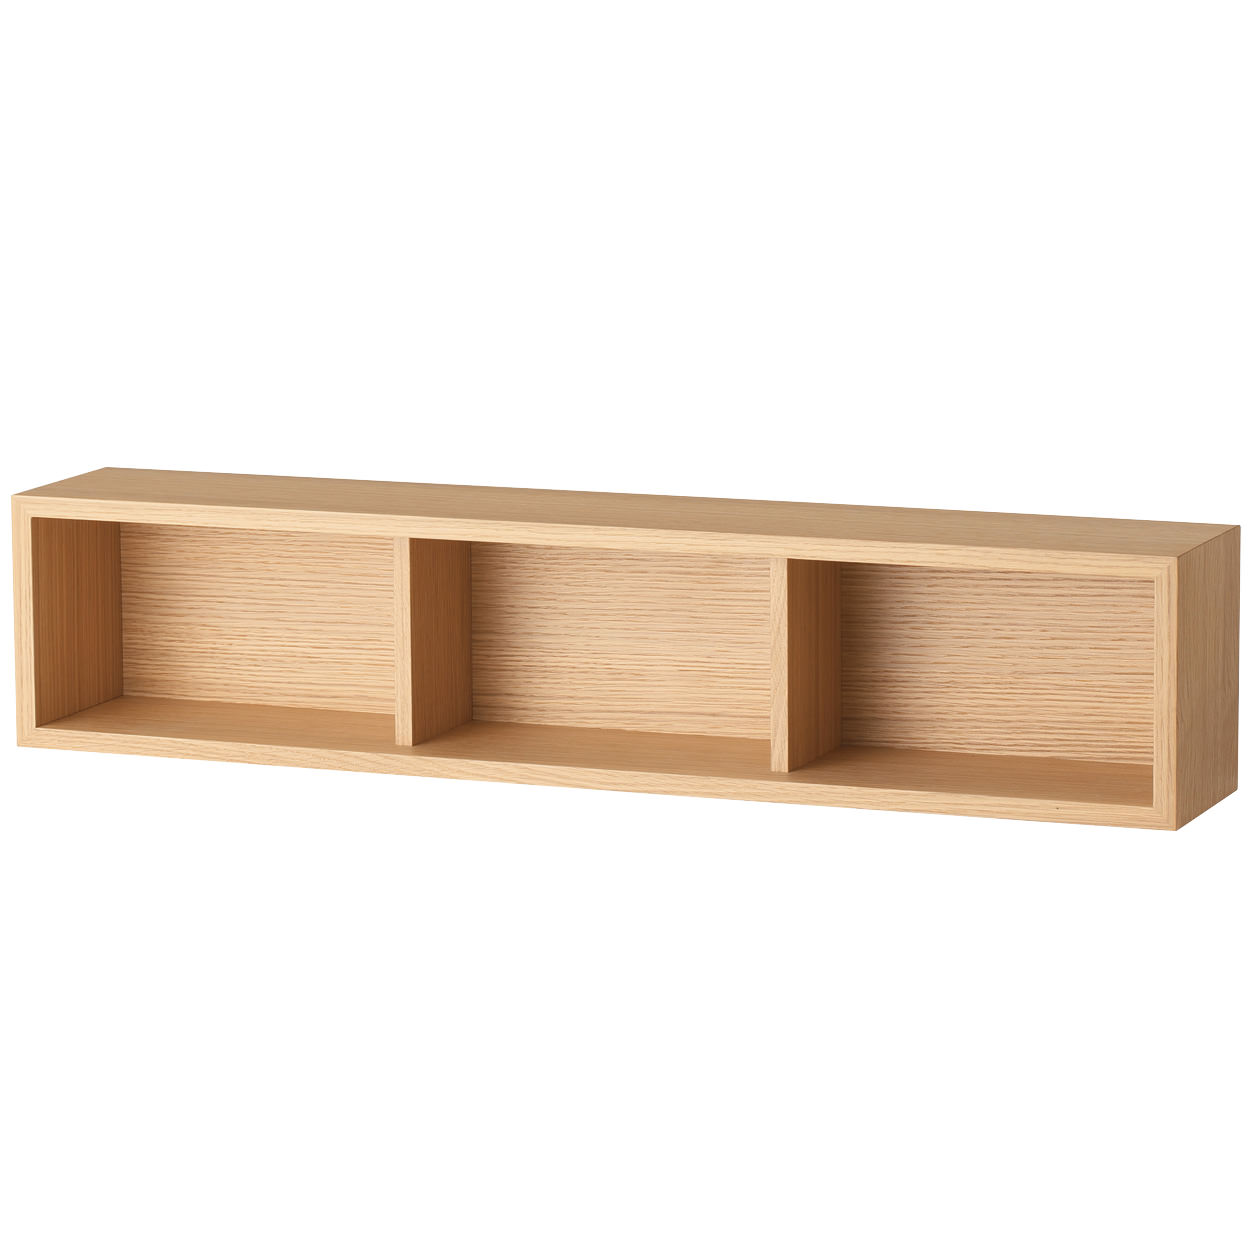 RoomClip商品情報 - 壁に付けられる家具・箱・幅88cm・オーク材